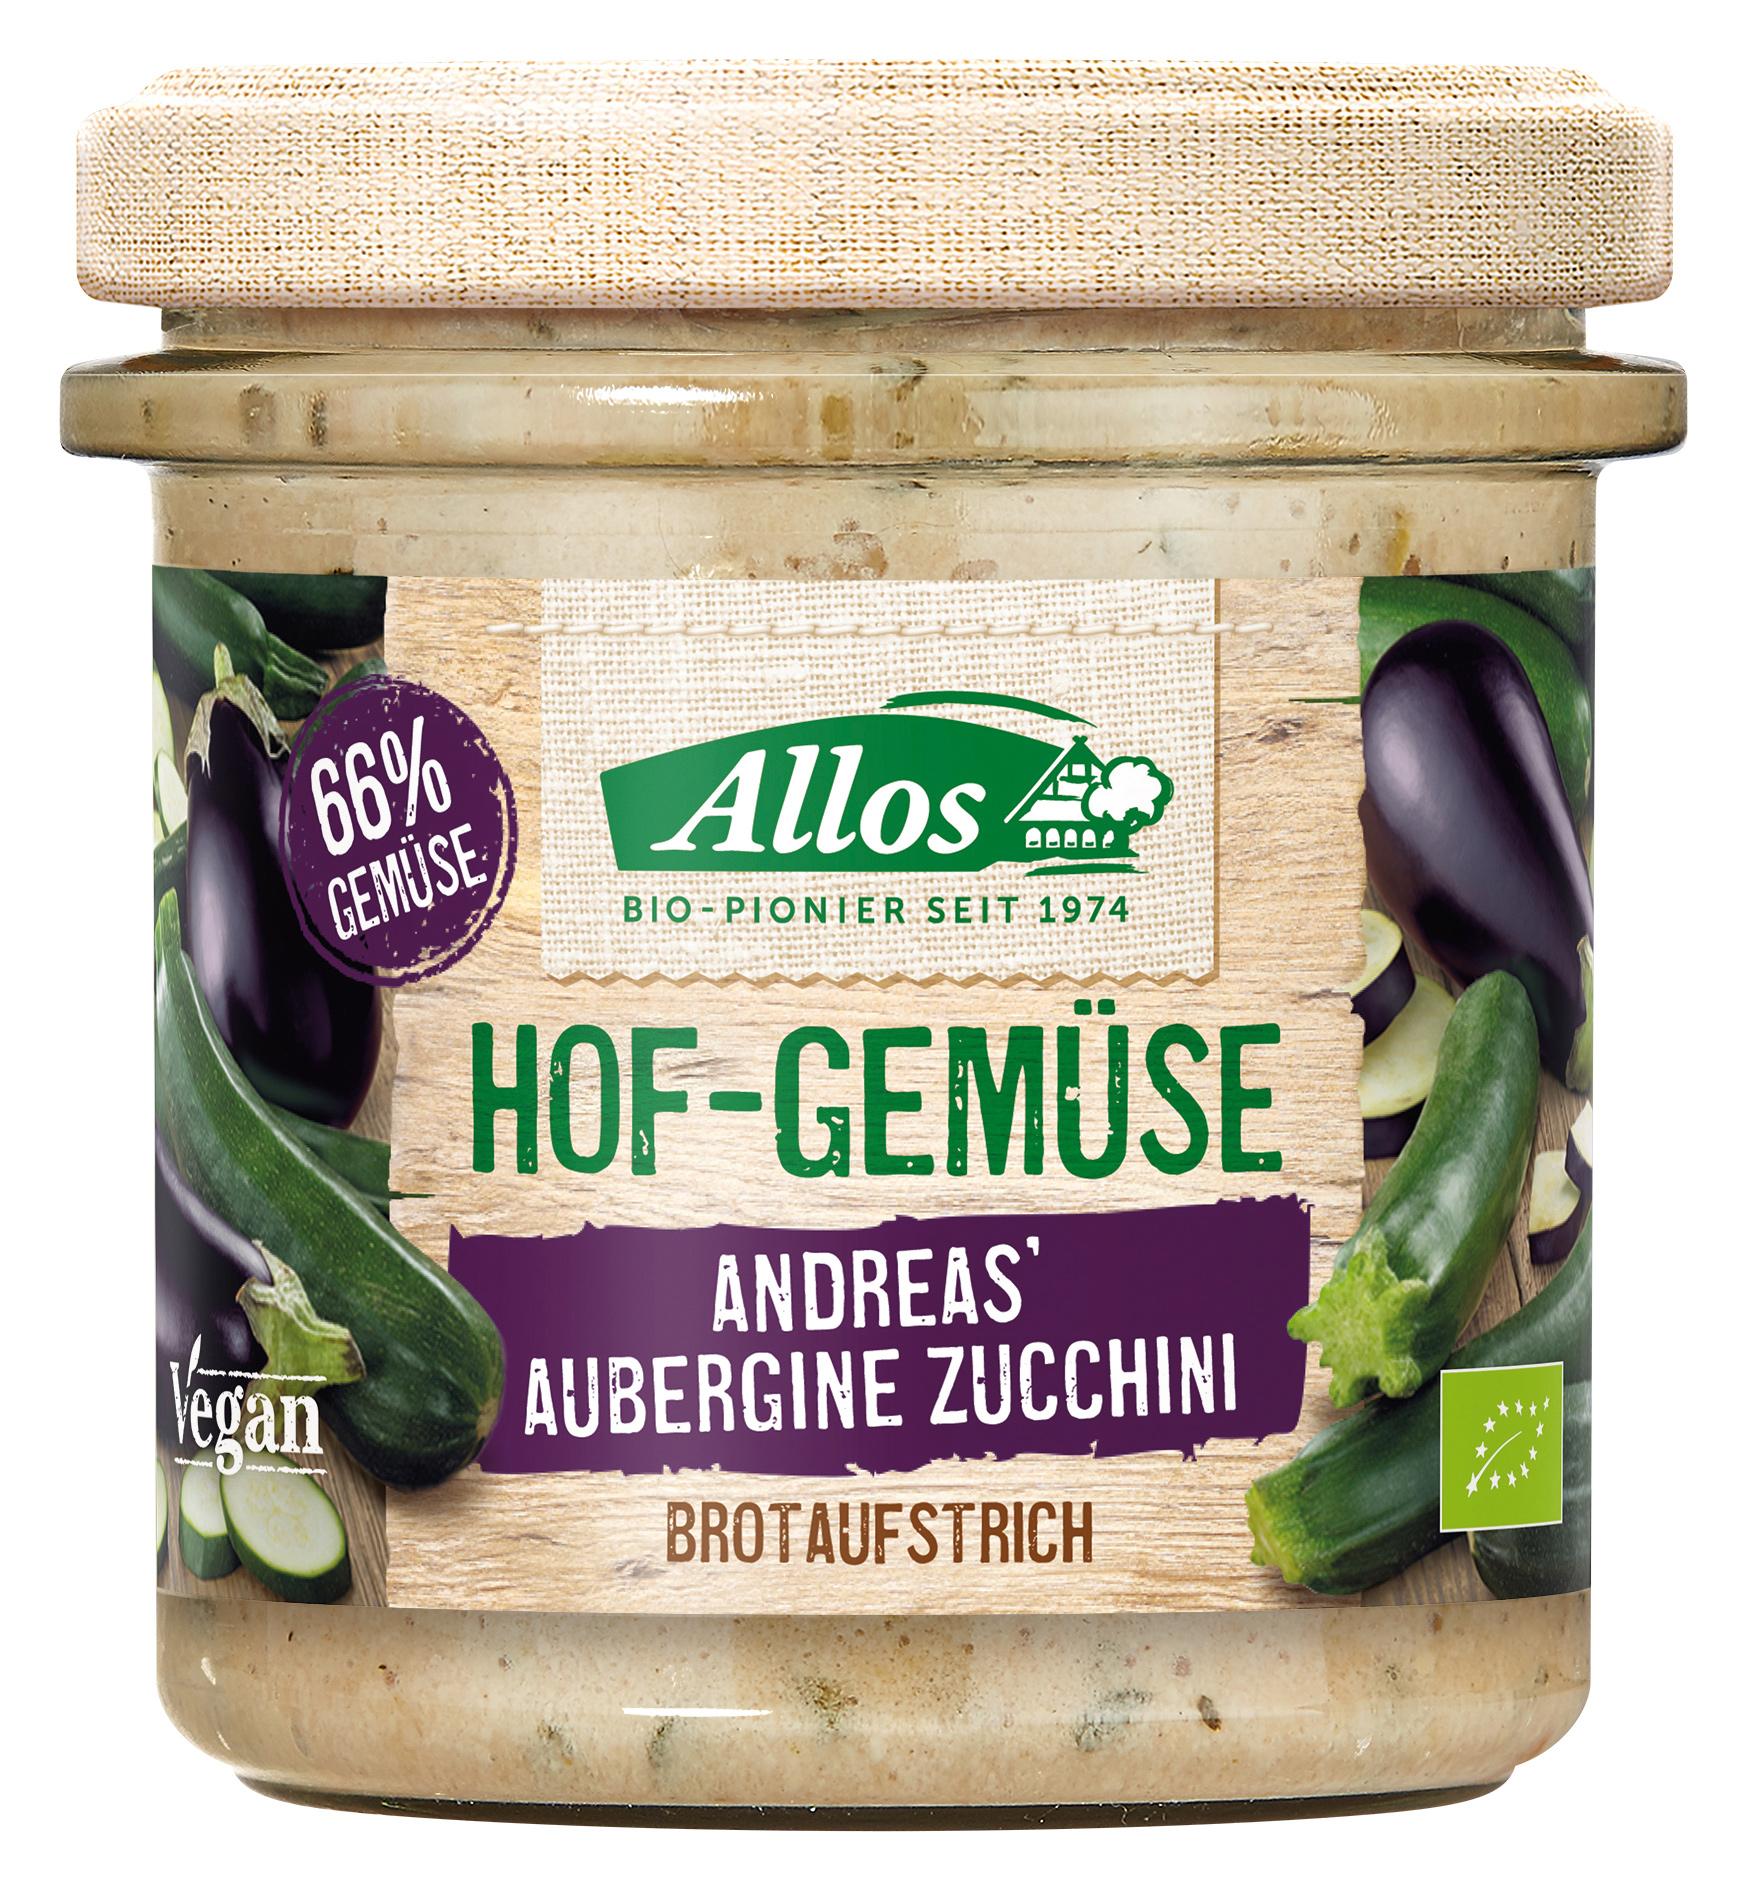 "Bio Brotaufstrich ""Andreas' Aubergine Zucchini"", 135 g"